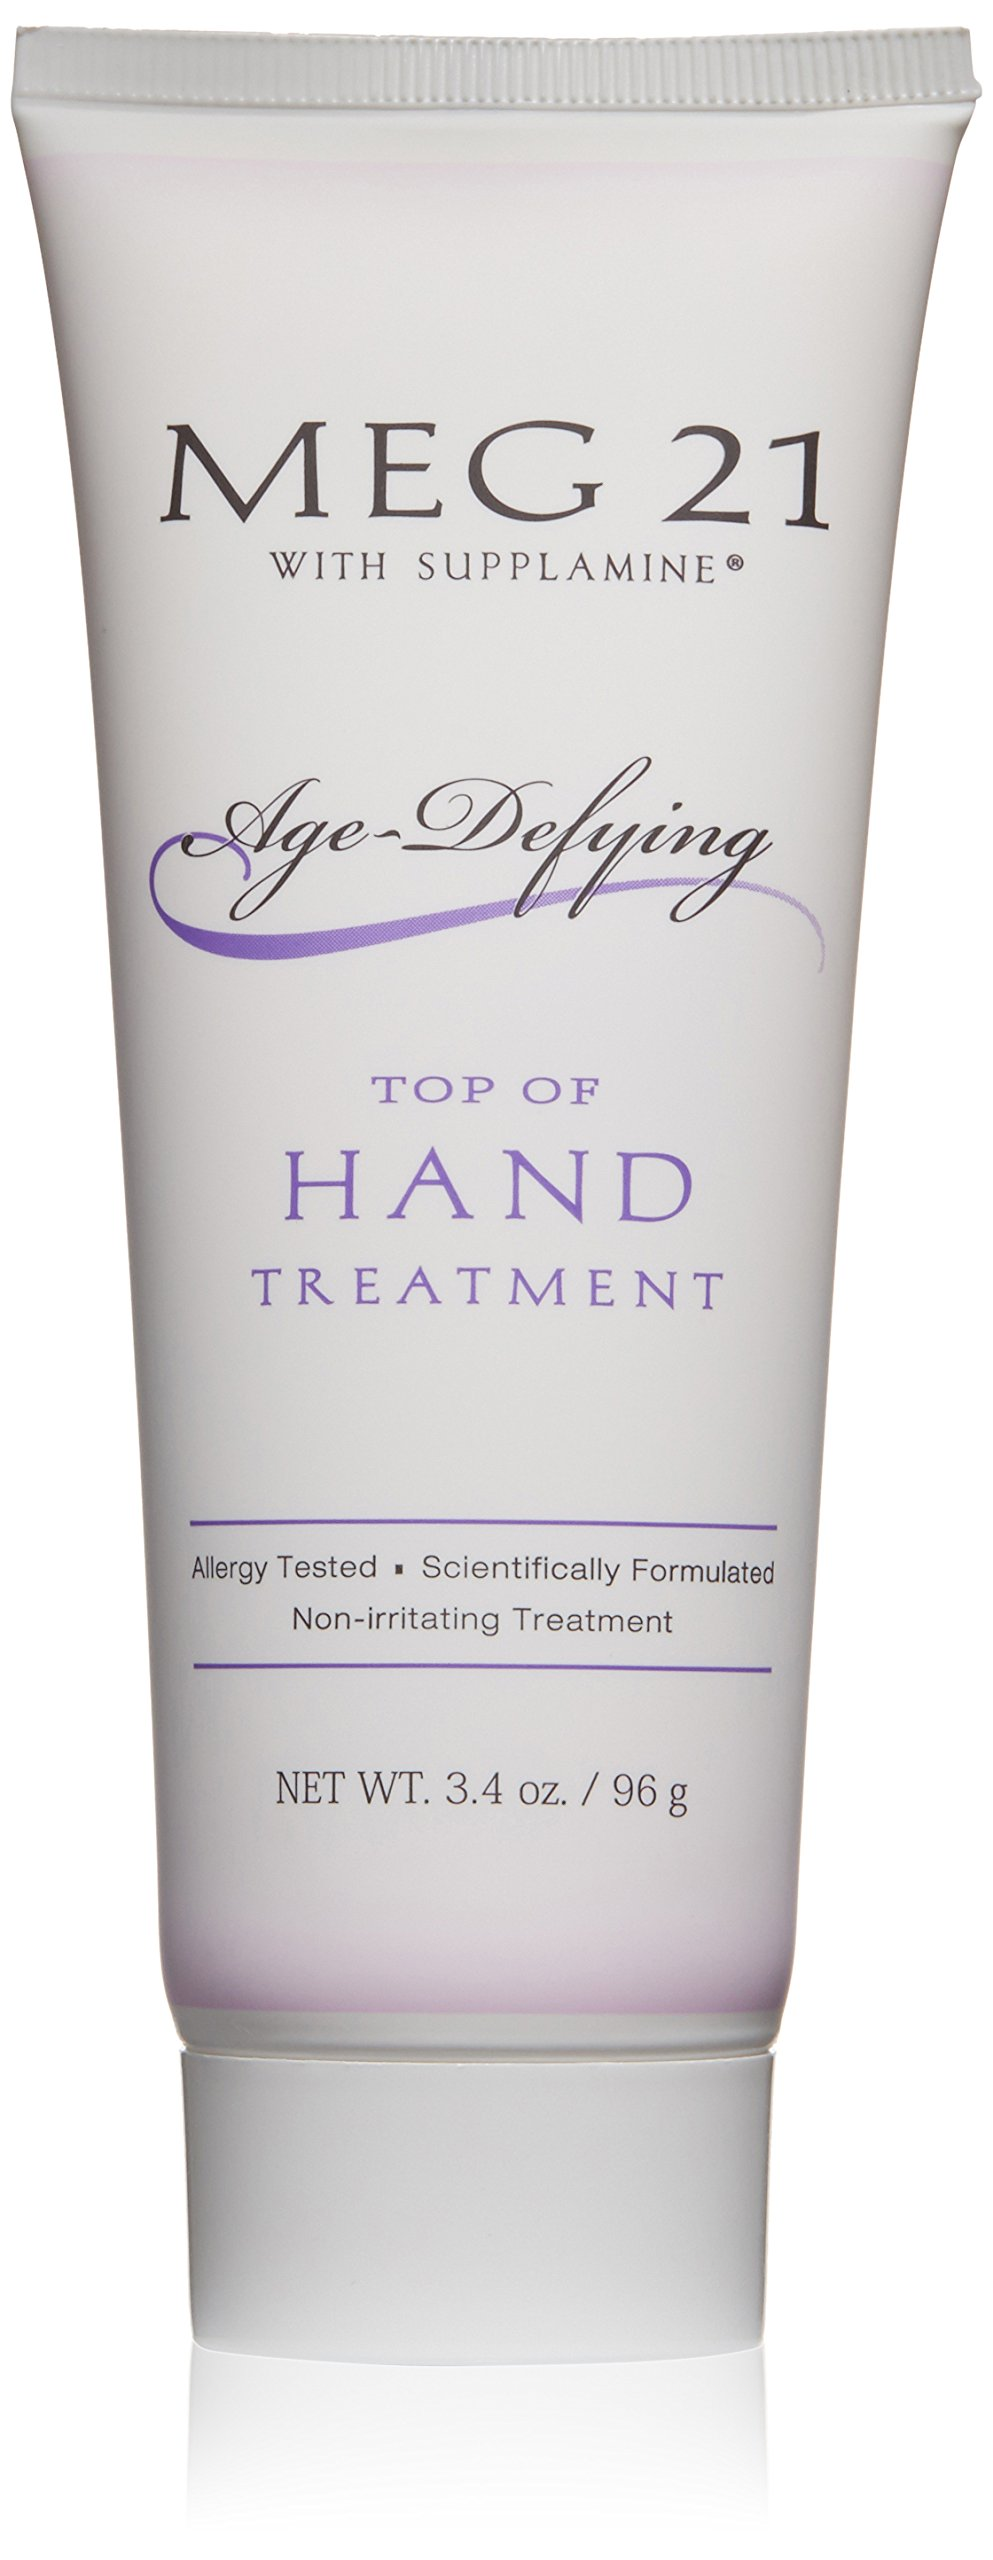 MEG 21 Age-Defying Hand Treatment Cream, 3.4 Oz